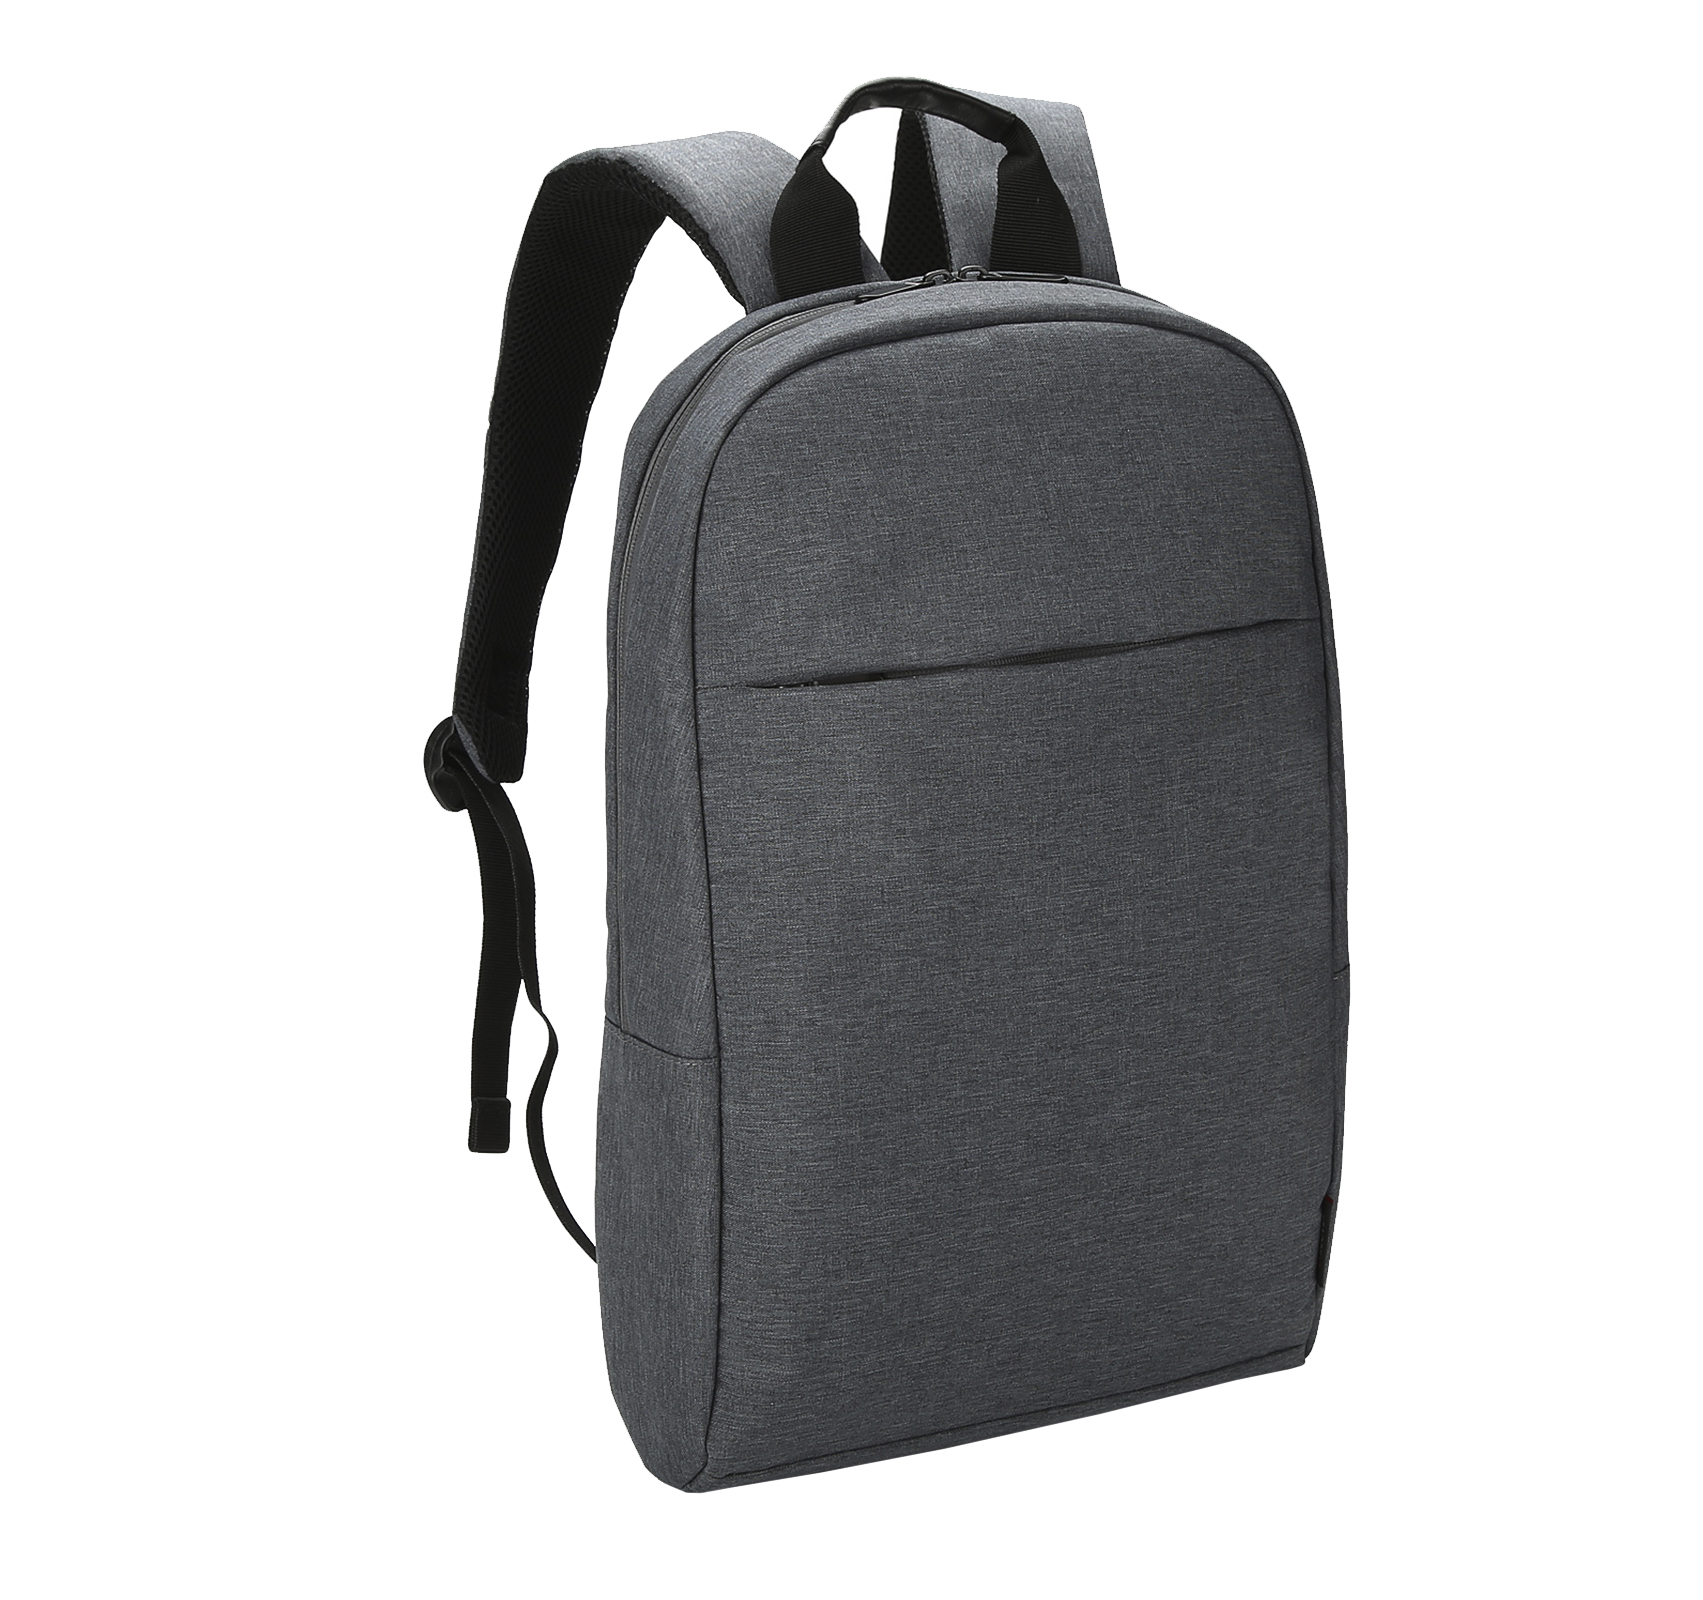 печать логотипа на рюкзаках